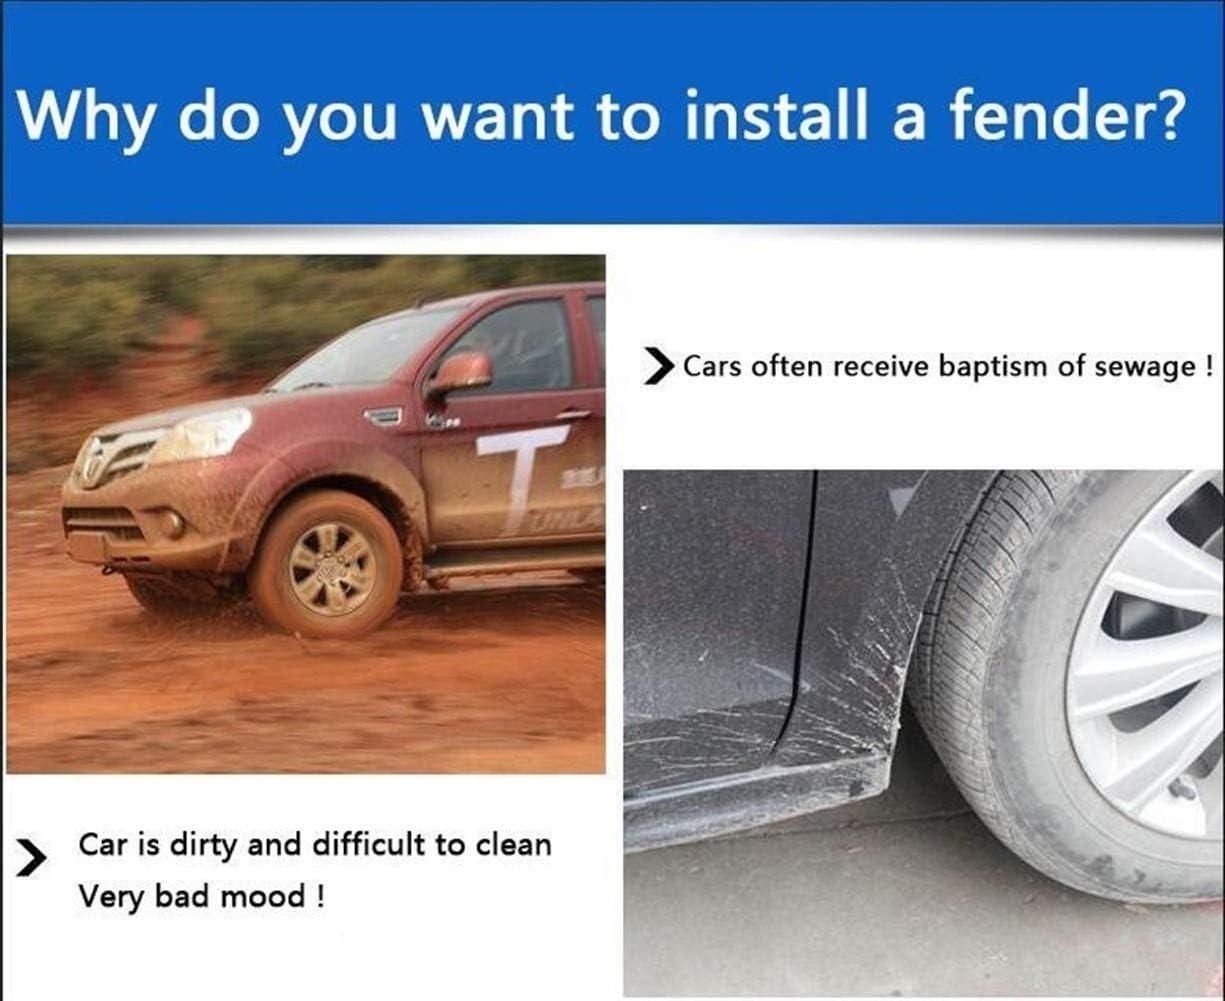 Nologo ROYAL STAR TY Front Rear Car Mud Flaps for Skoda Kodiaq 2016 2017 2018 Mudflaps Splash Guards Mud Flap Mudguards Fender Car Accessories